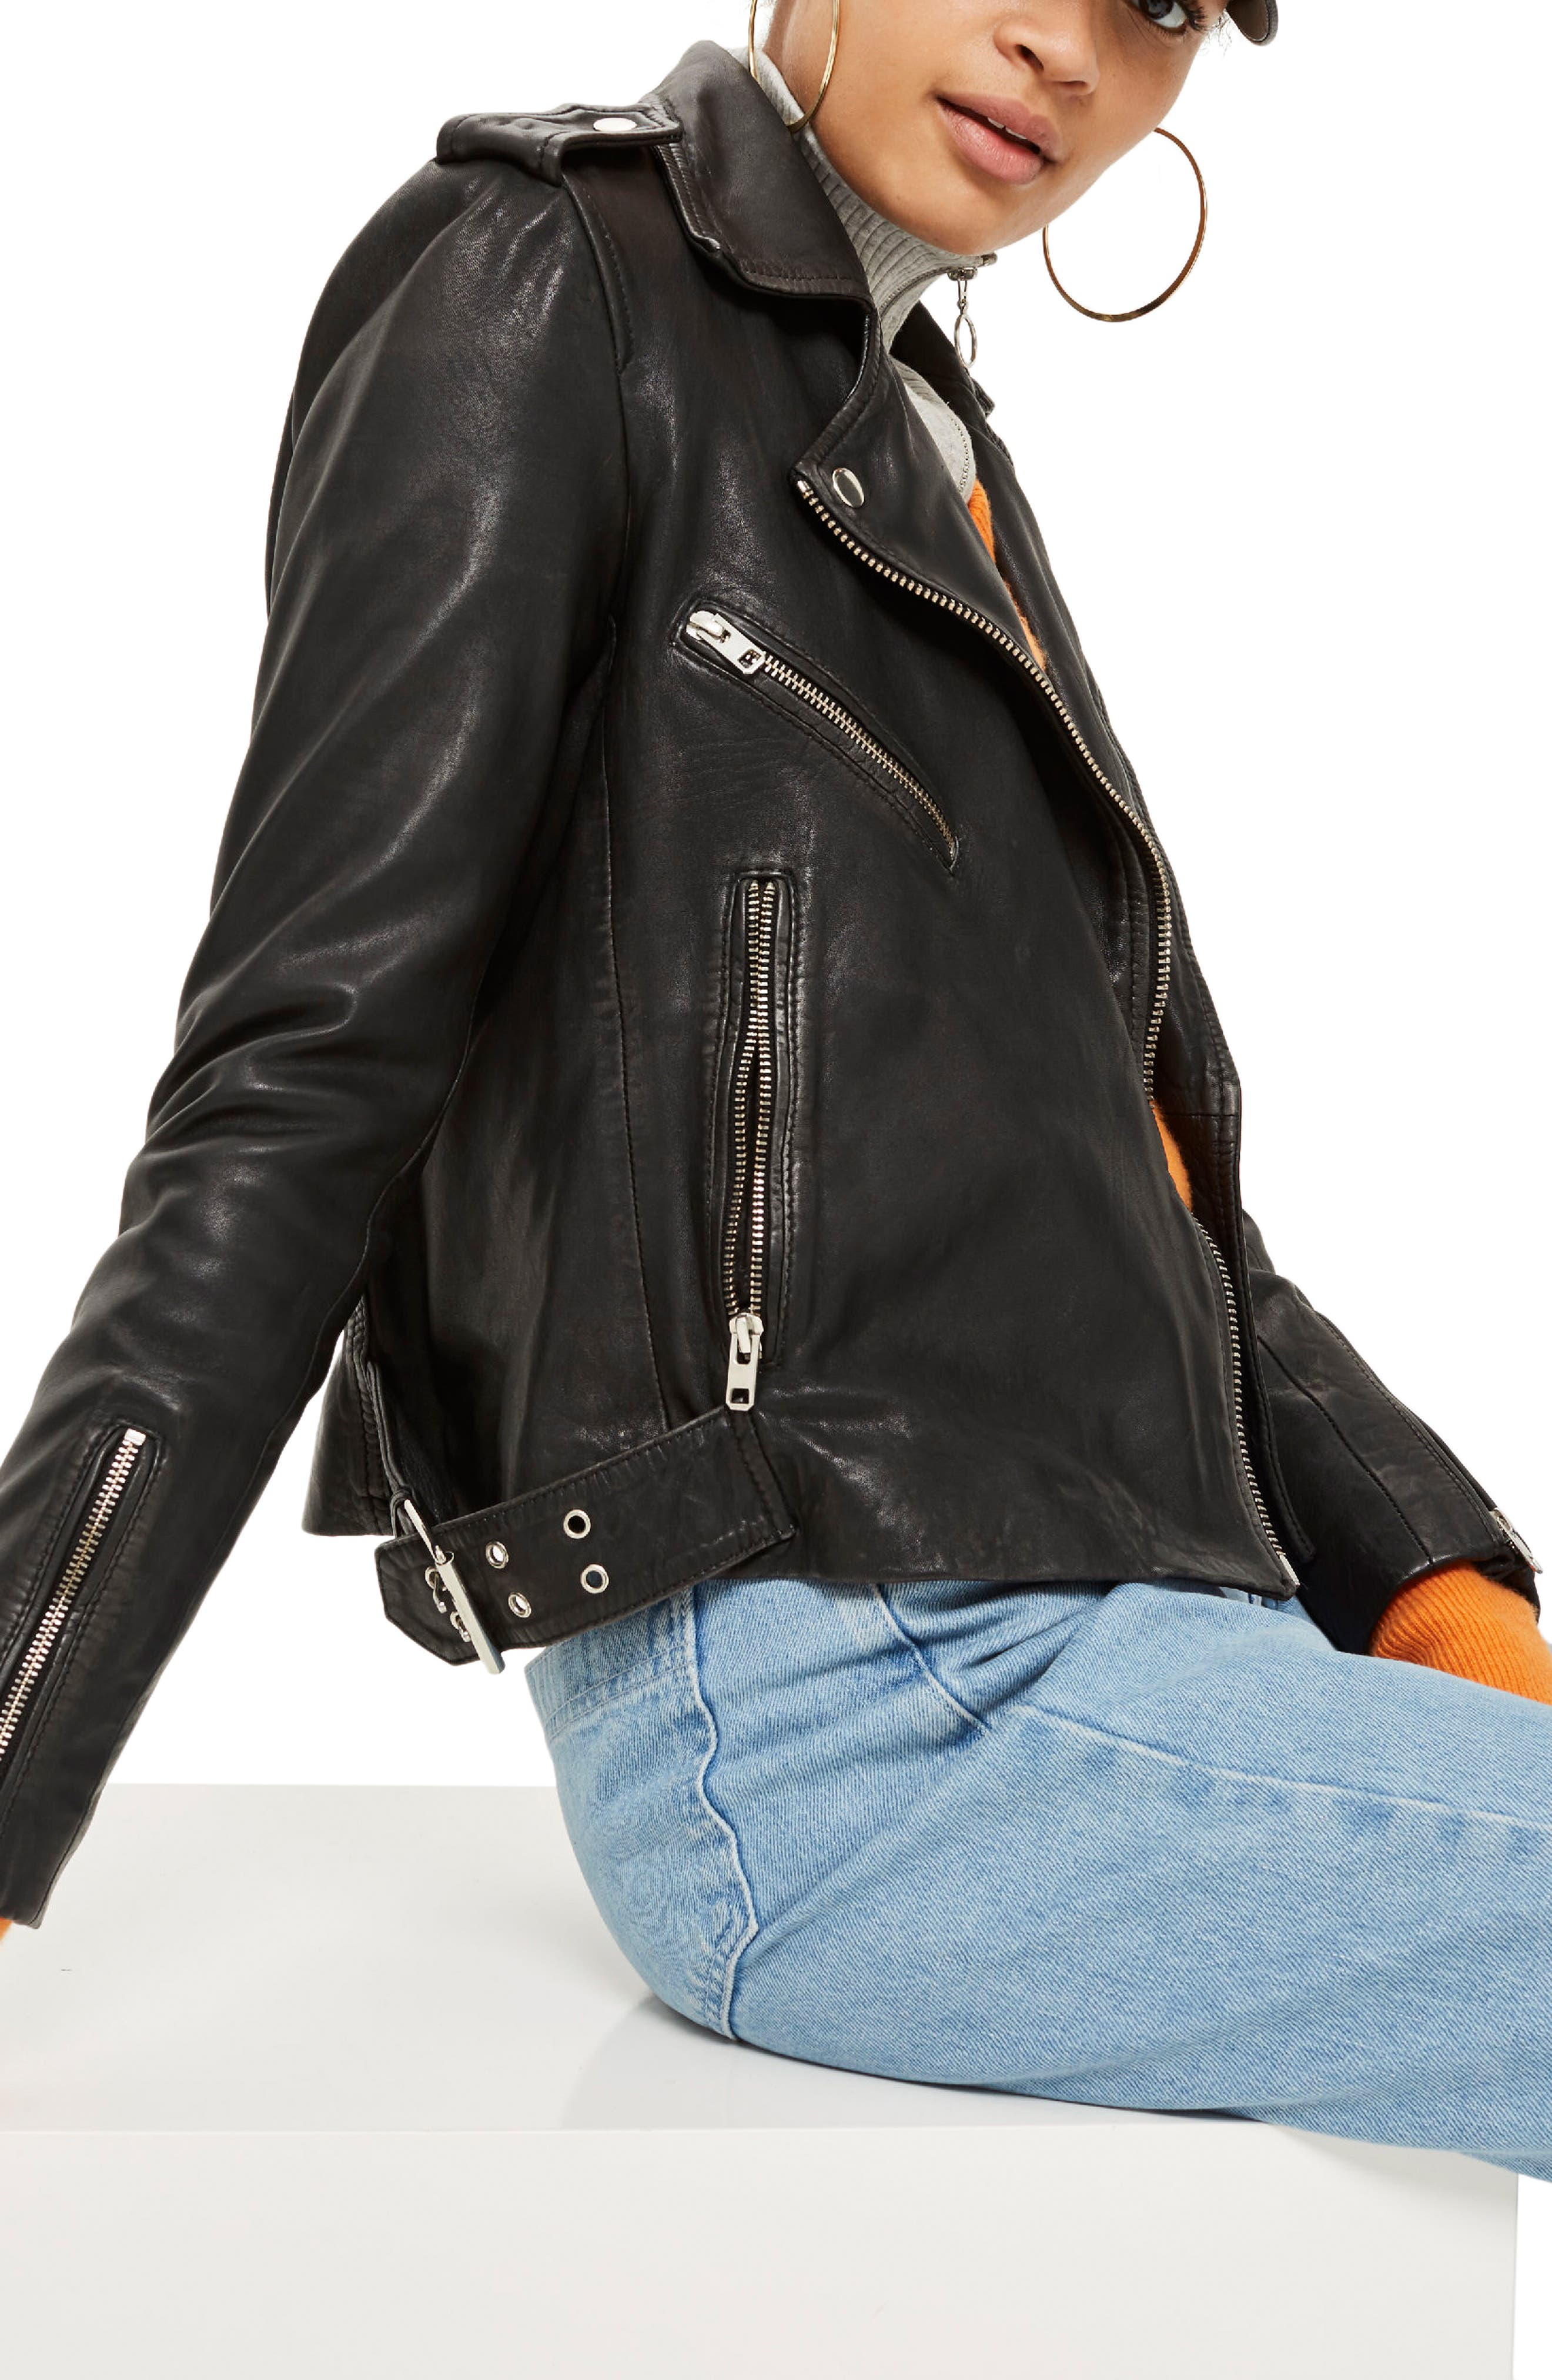 Strike Leather Biker Jacket,                             Alternate thumbnail 3, color,                             Black